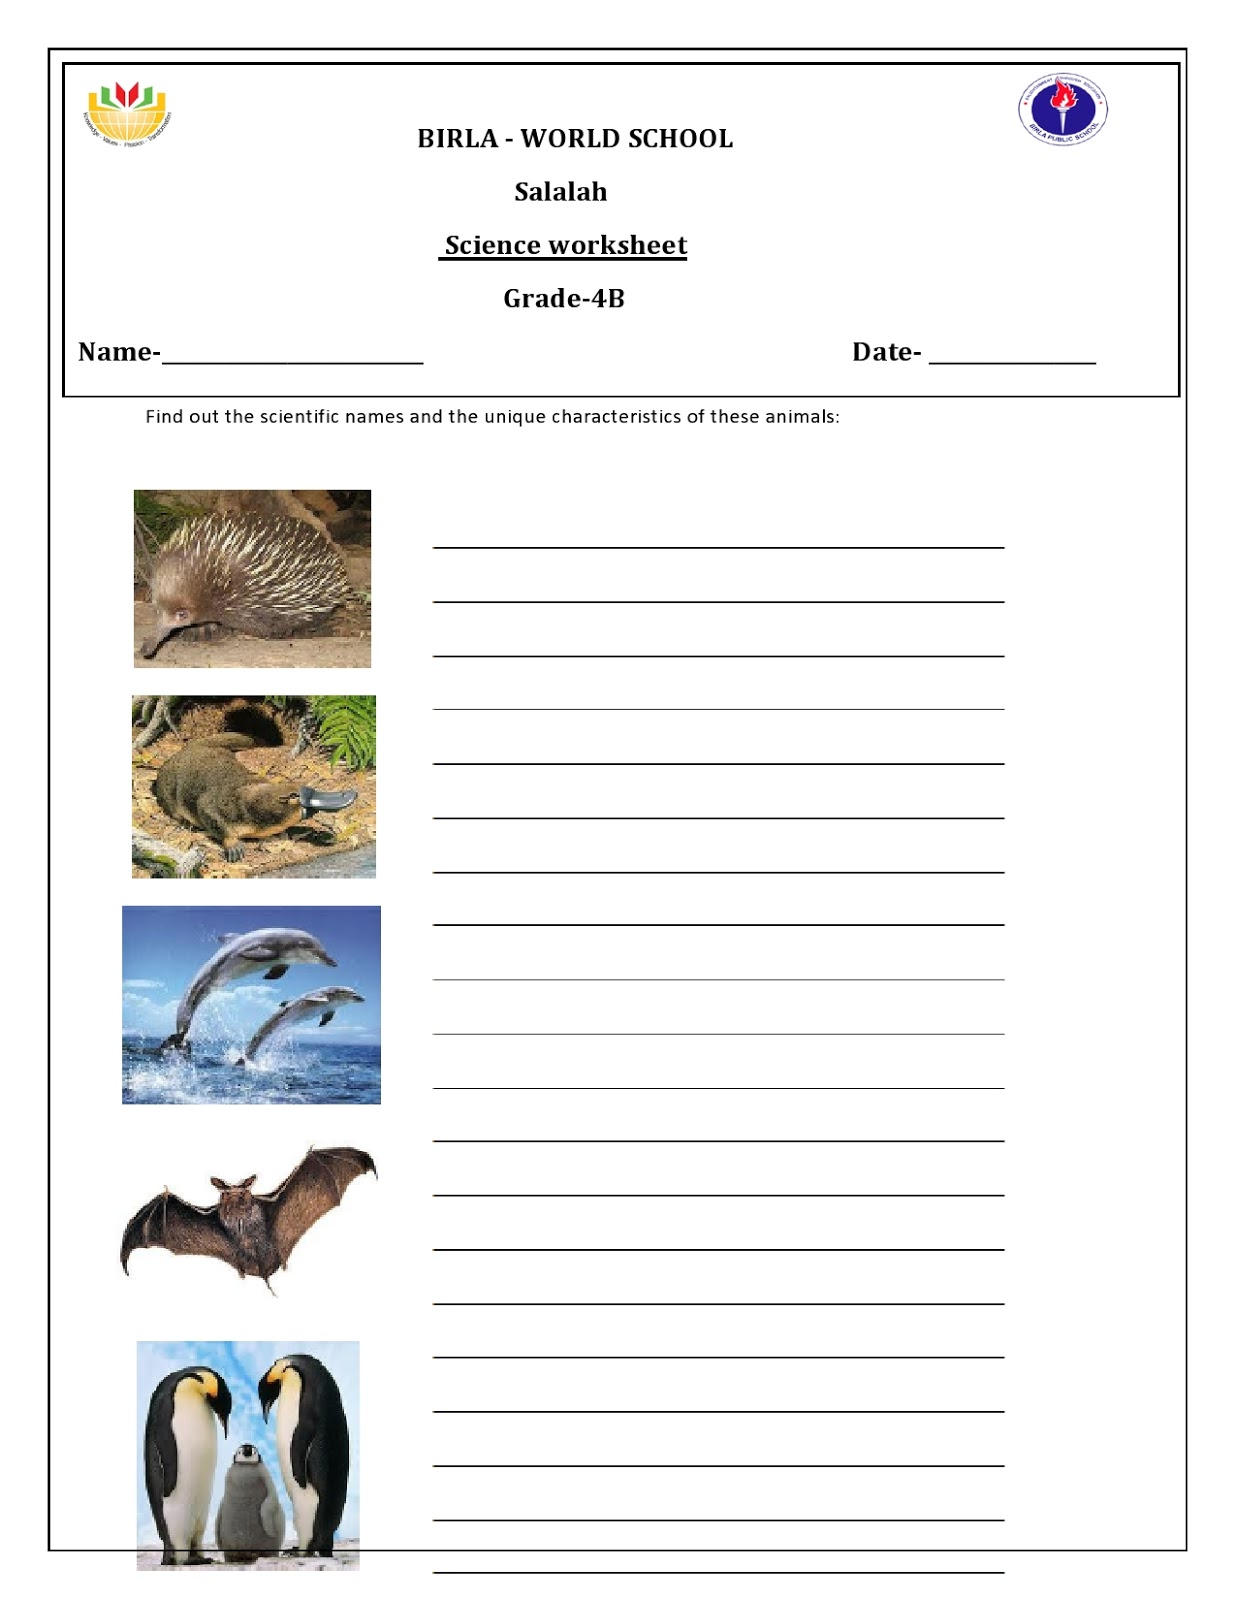 Birla World School Oman Homework For Grade 4 B On 01 09 16